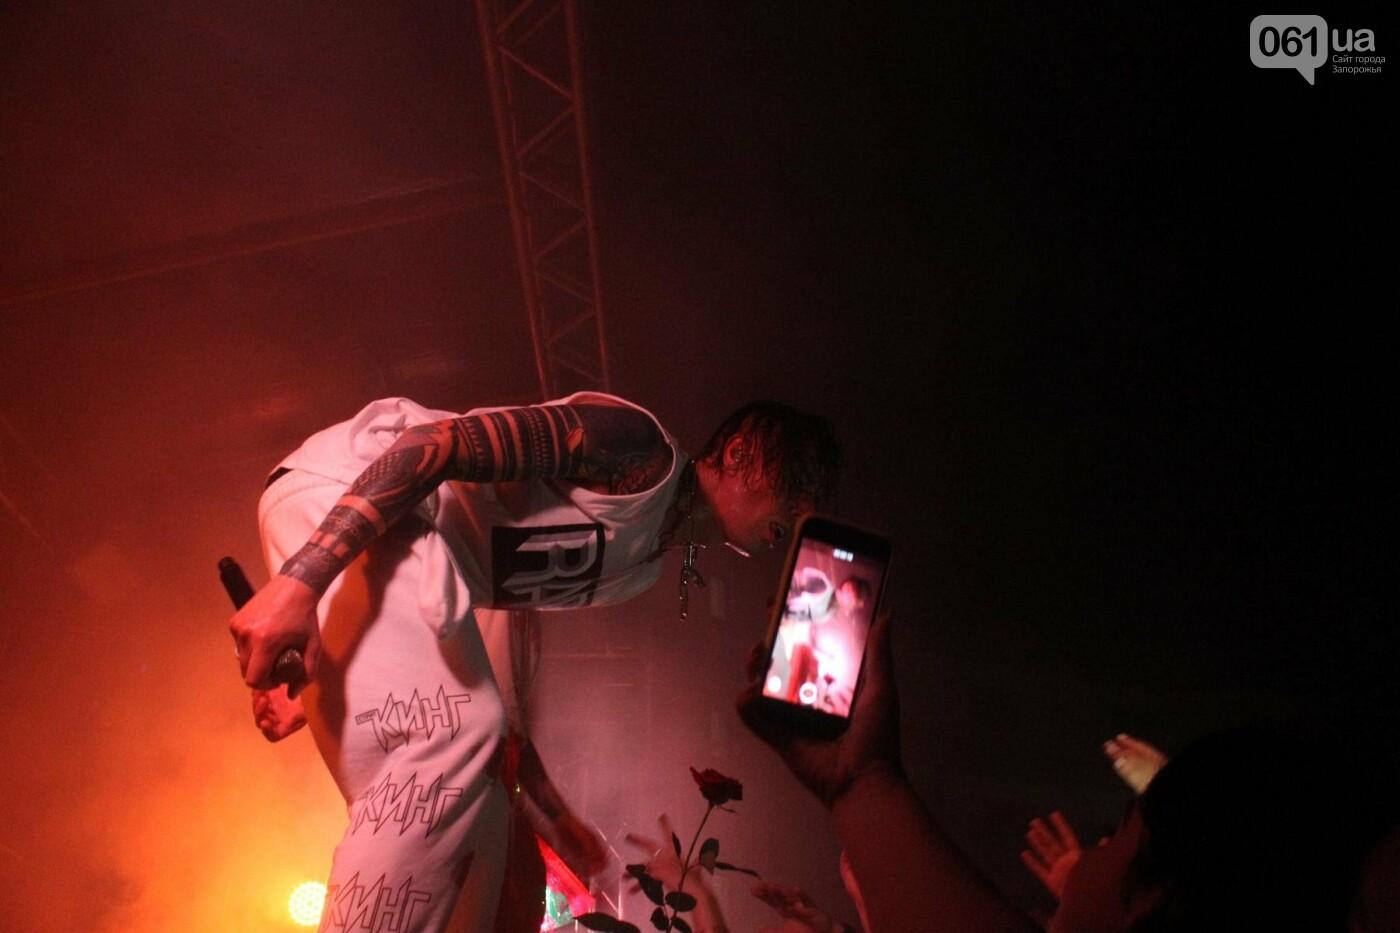 ALEKSEEV, «Агонь» и MamaRika: в Запорожье звезды устроили яркий концерт на «Miss AVRORA Summer 2018», – ФОТОРЕПОРТАЖ, фото-18